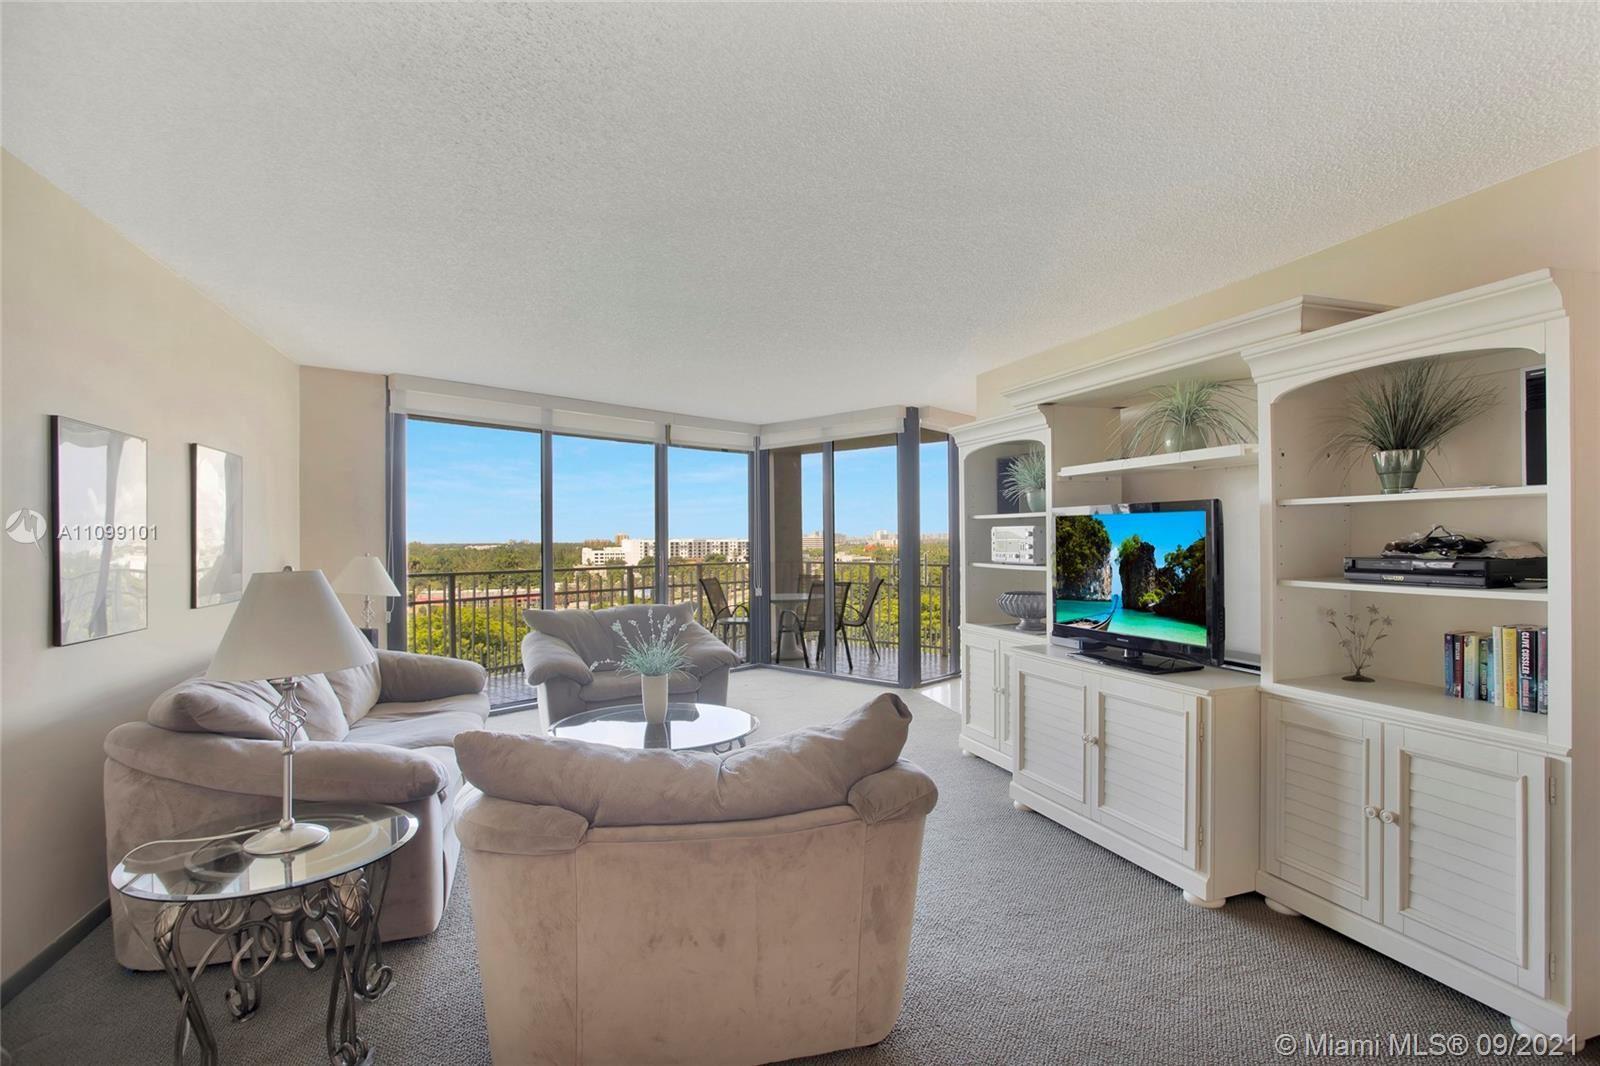 2000 Towerside Ter #1005, Miami, FL 33138 - #: A11099101